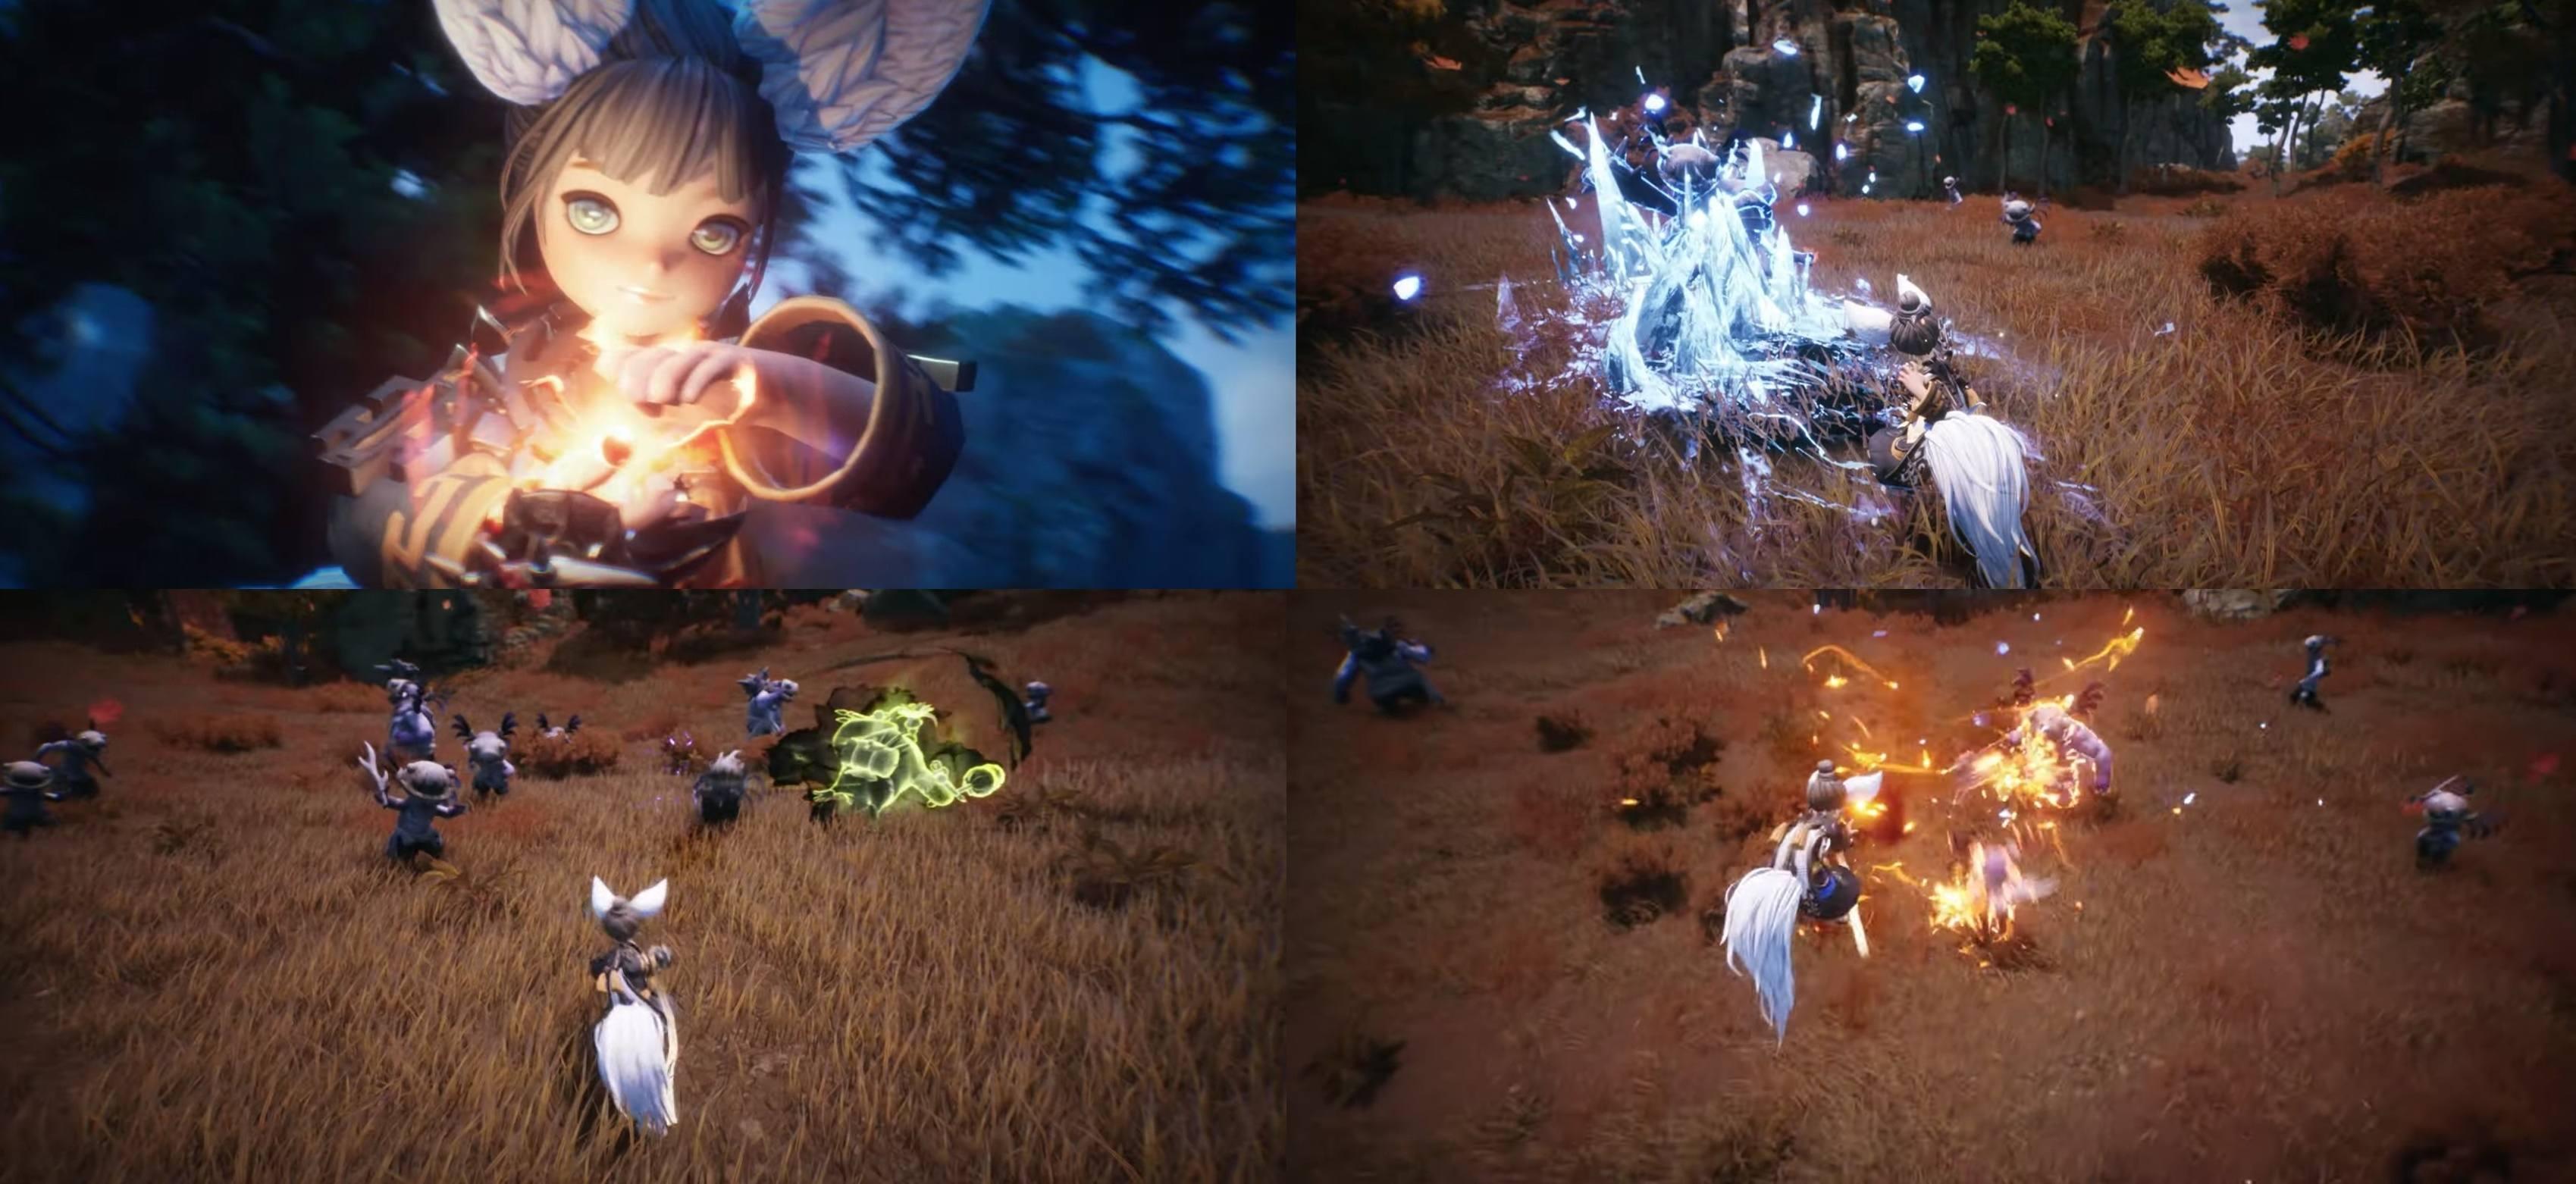 PC에서 만날 수 있는 MMORPG 블레이드 앤 소울 2, 내 취향에 맞는 클래스는?